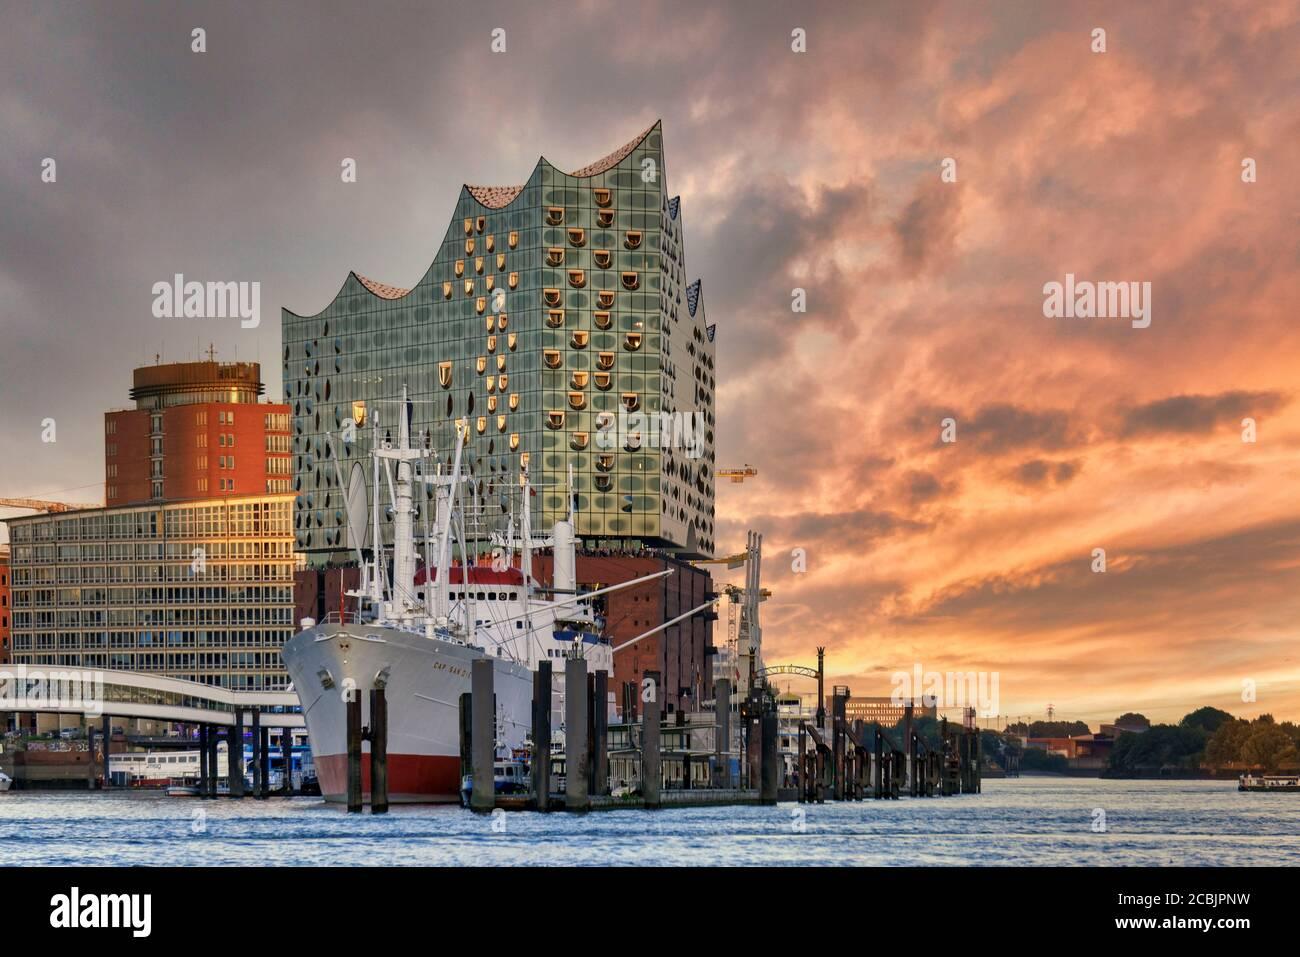 Elbphilharmonie , Cap San Diego Museumsschiff, Museumsfrachtschiff, HafenCity, Hamburgo, Alemania, Europa Foto de stock